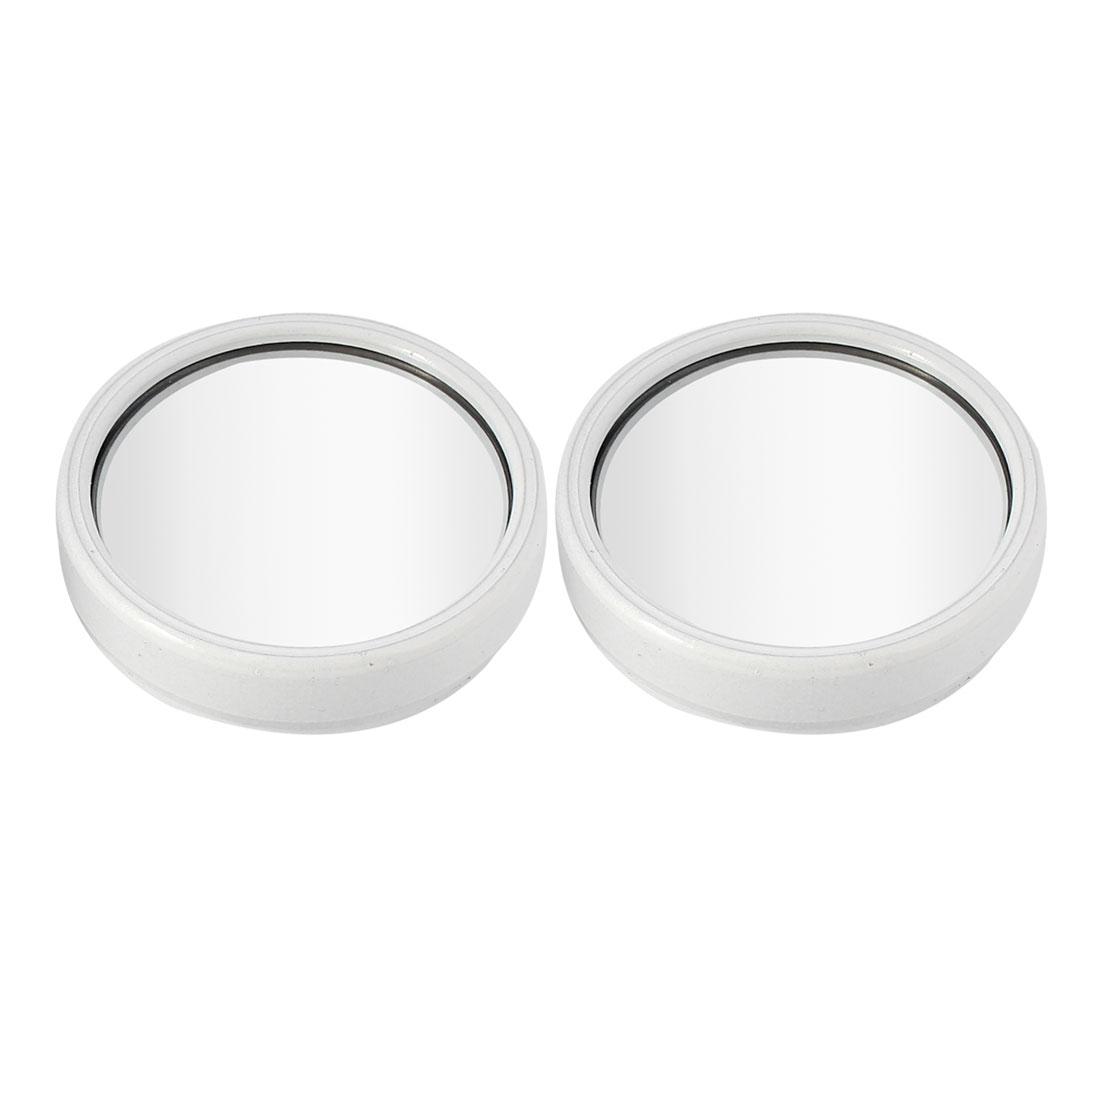 "2 Pcs Car White Plastic Adhesive Wide Angle Convex Blind Spot Mirror Rearmirror 2.2"" Dia"